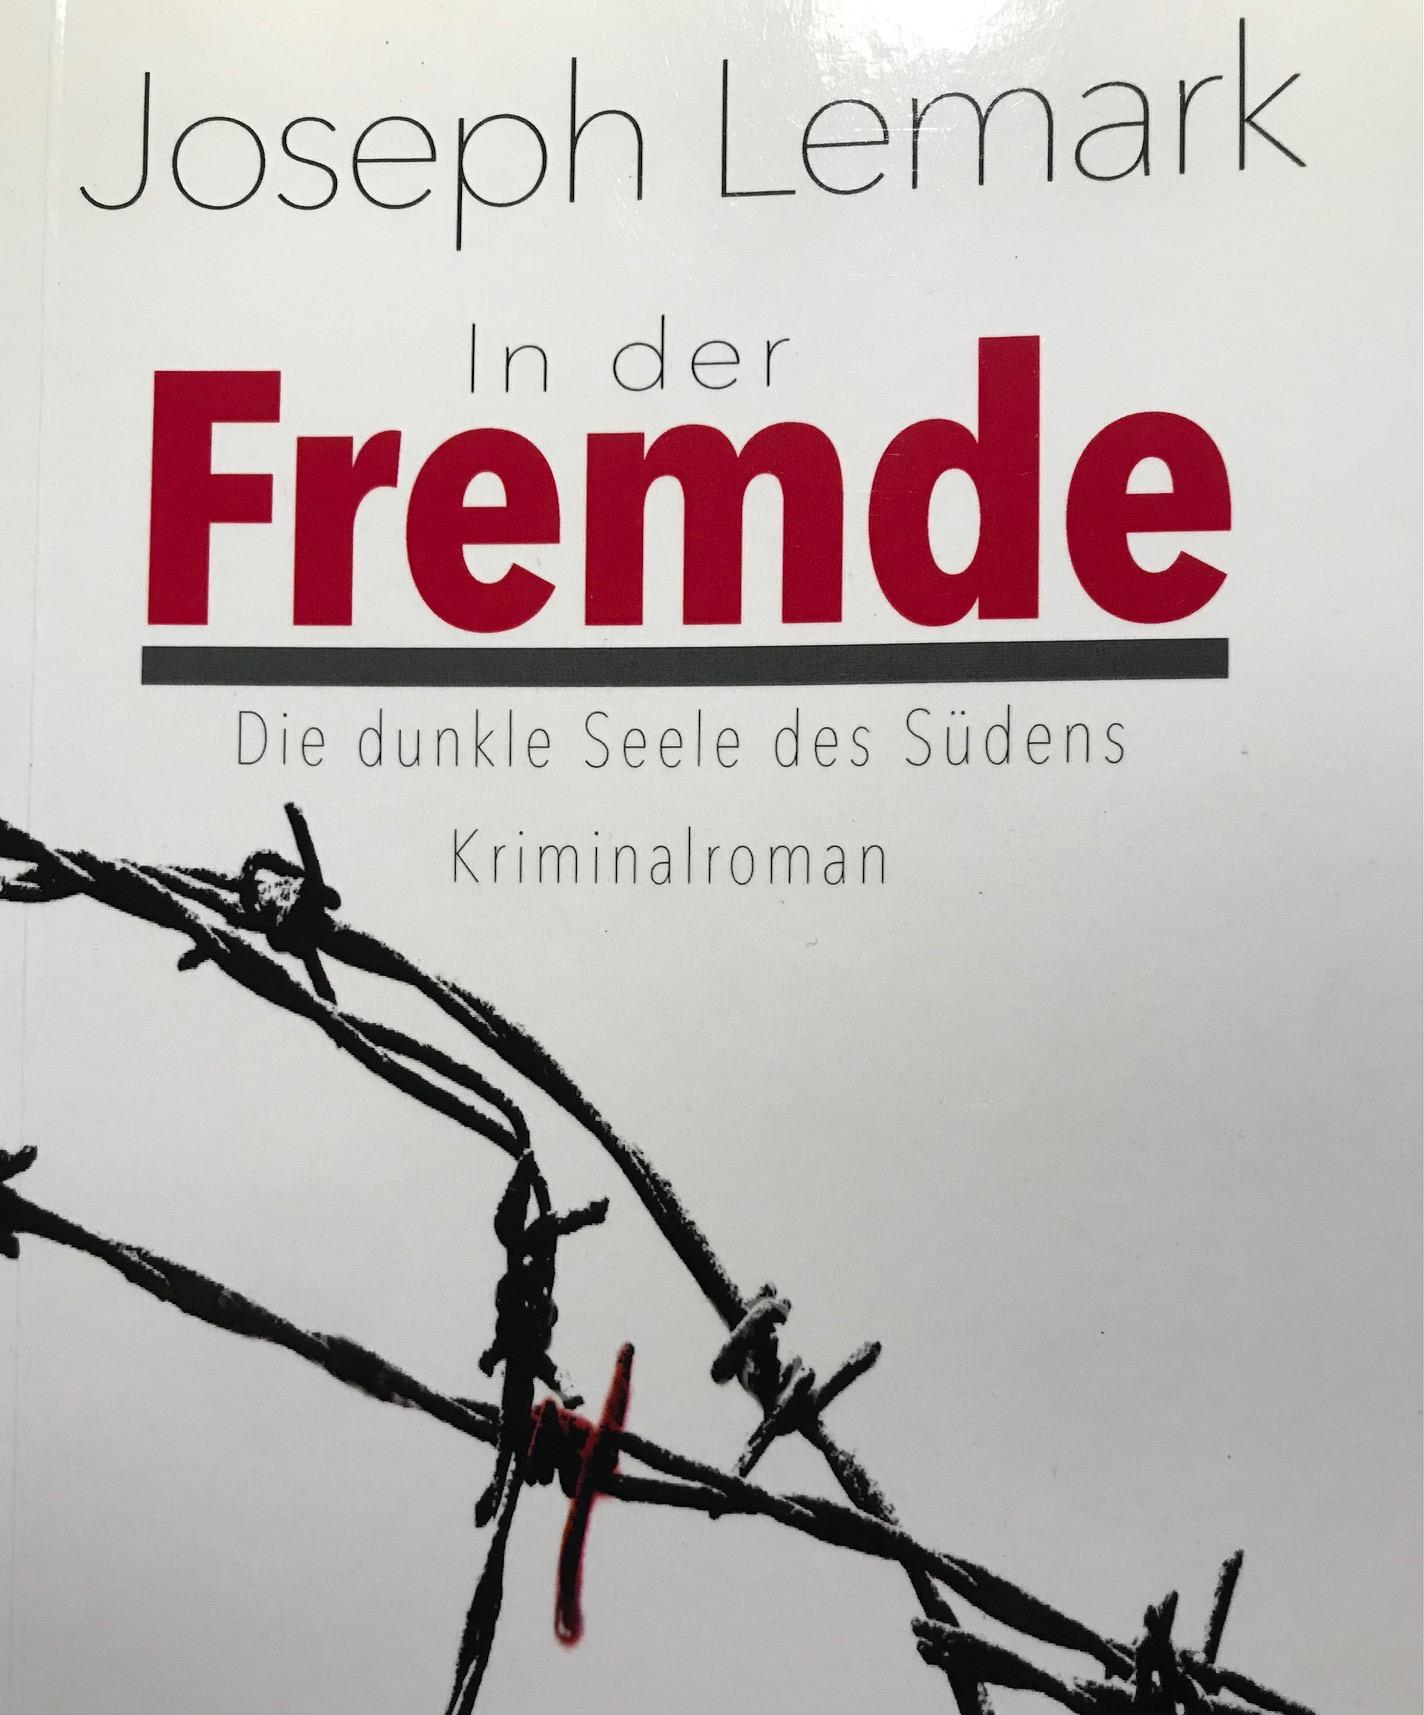 Joseph Lemark